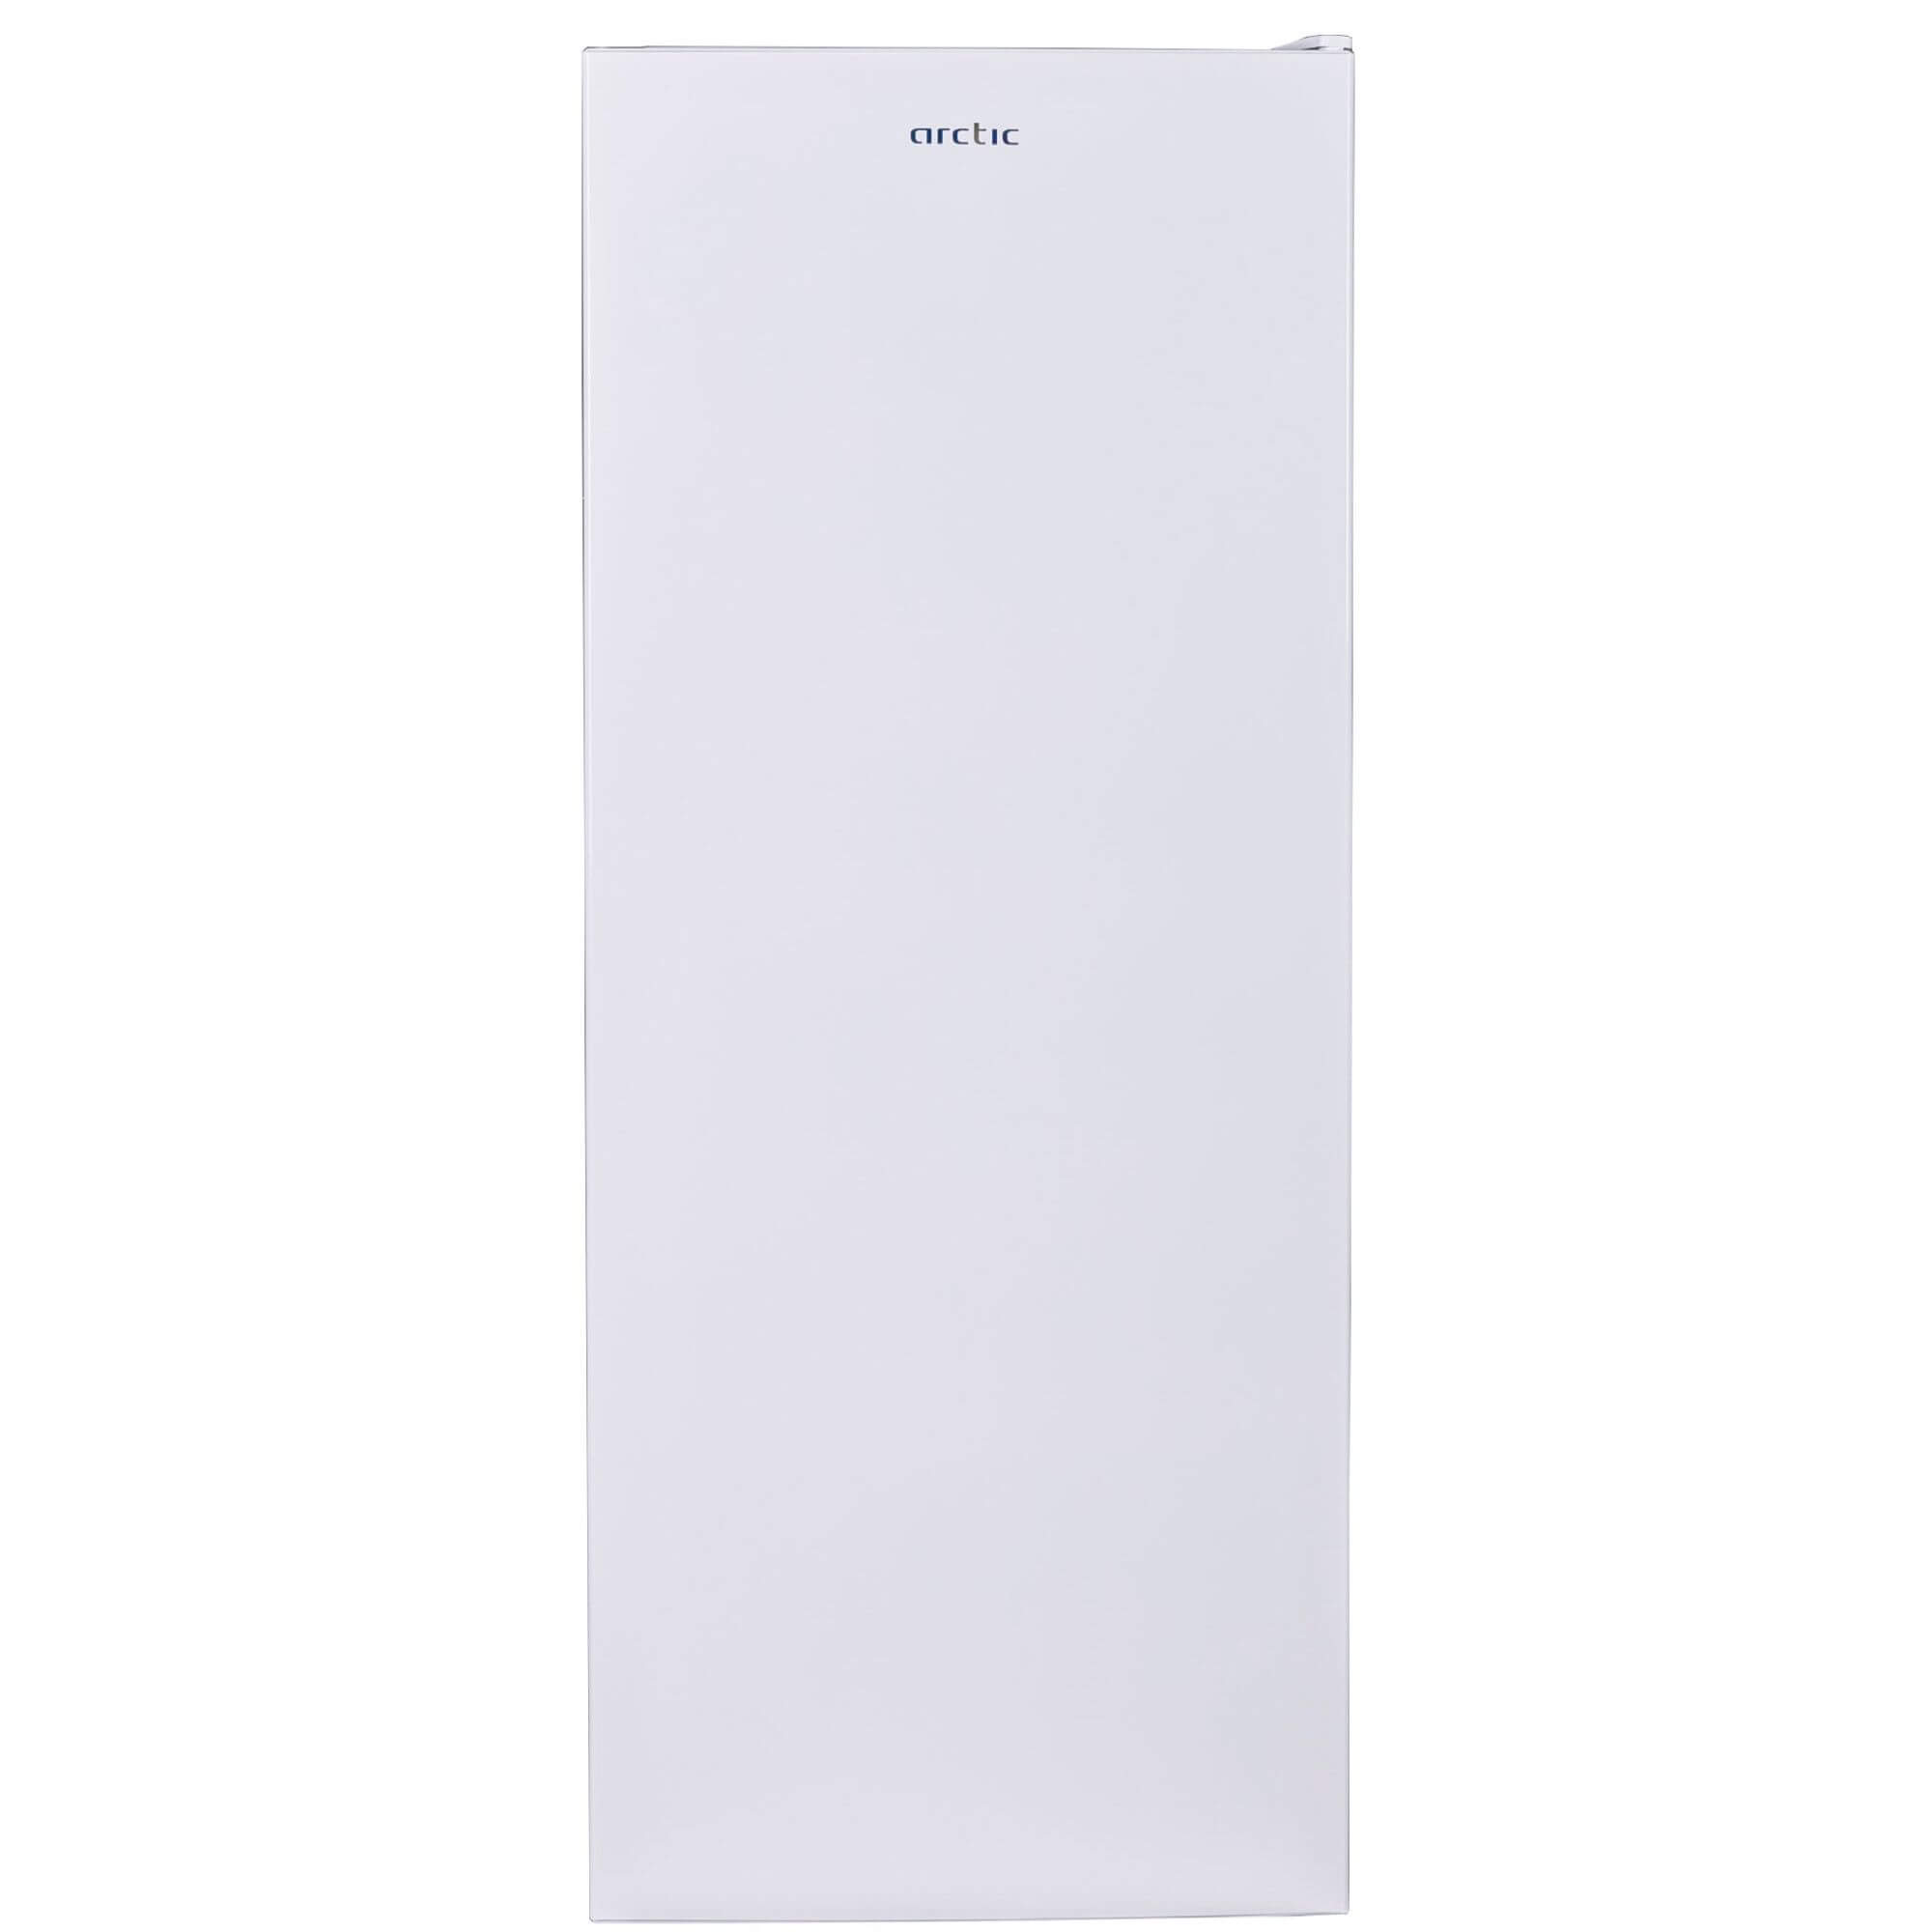 Congelator Arctic AC54210+, 168 l, Clasa A+, 6 sertare, H 139.5 cm, Alb